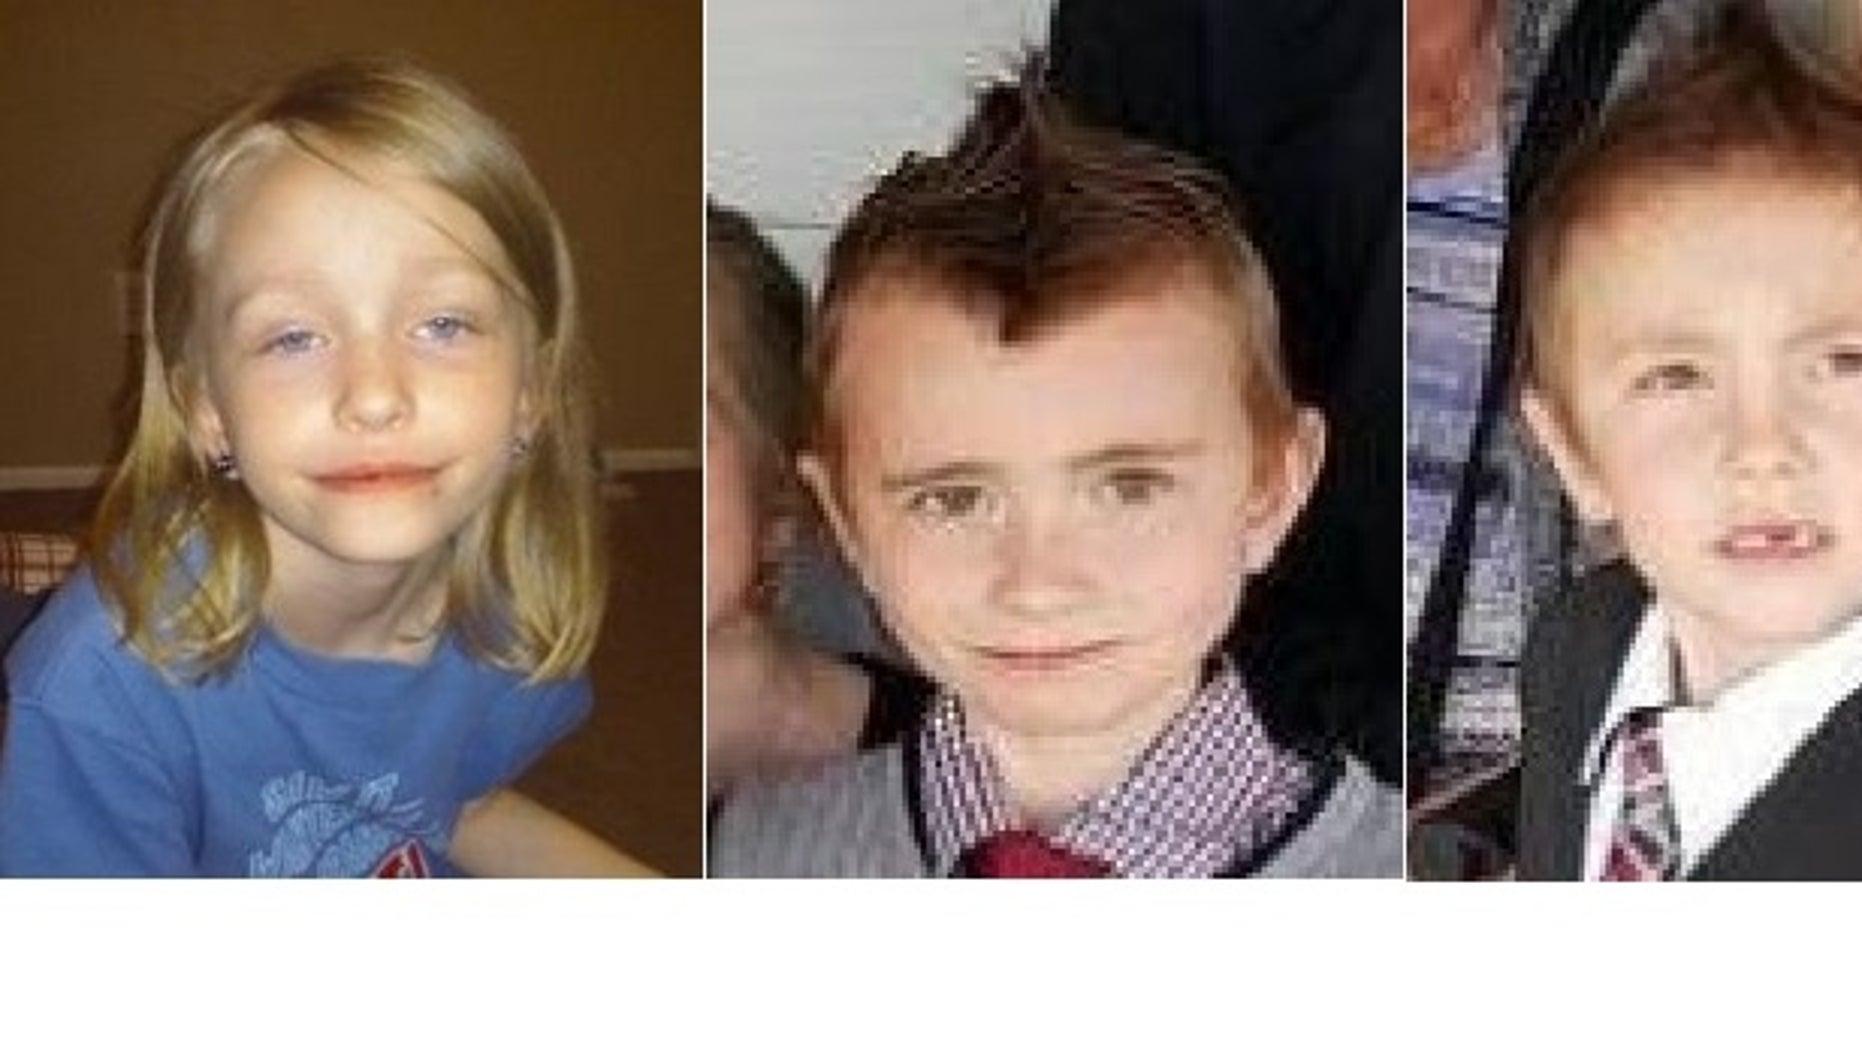 From left to right: Kaylee Dunn, Lewis Dunn, Kadyn Simon.